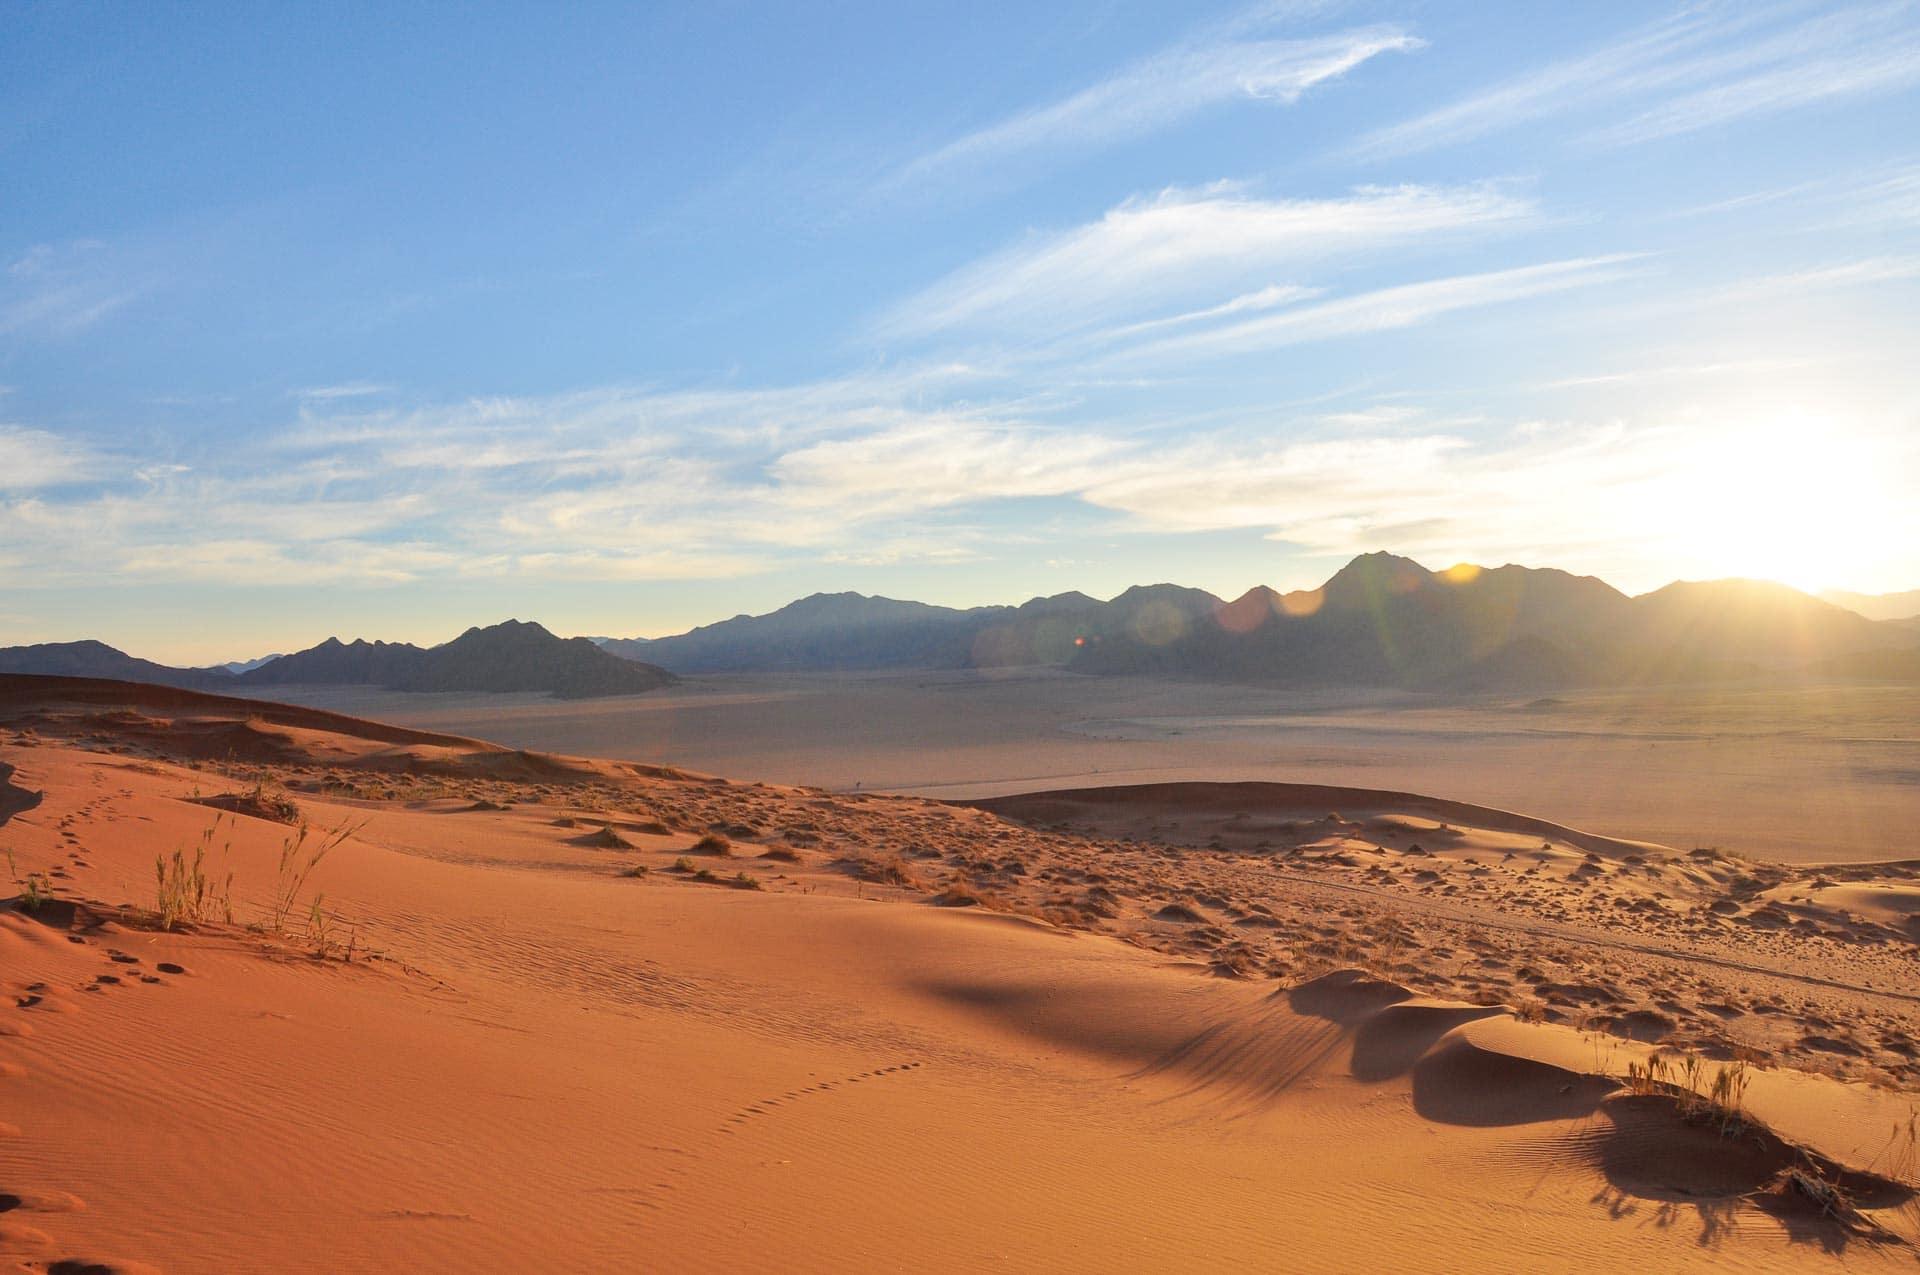 Kanaan-Desert-Retreat-Namibia-Globetrotter-Select-37